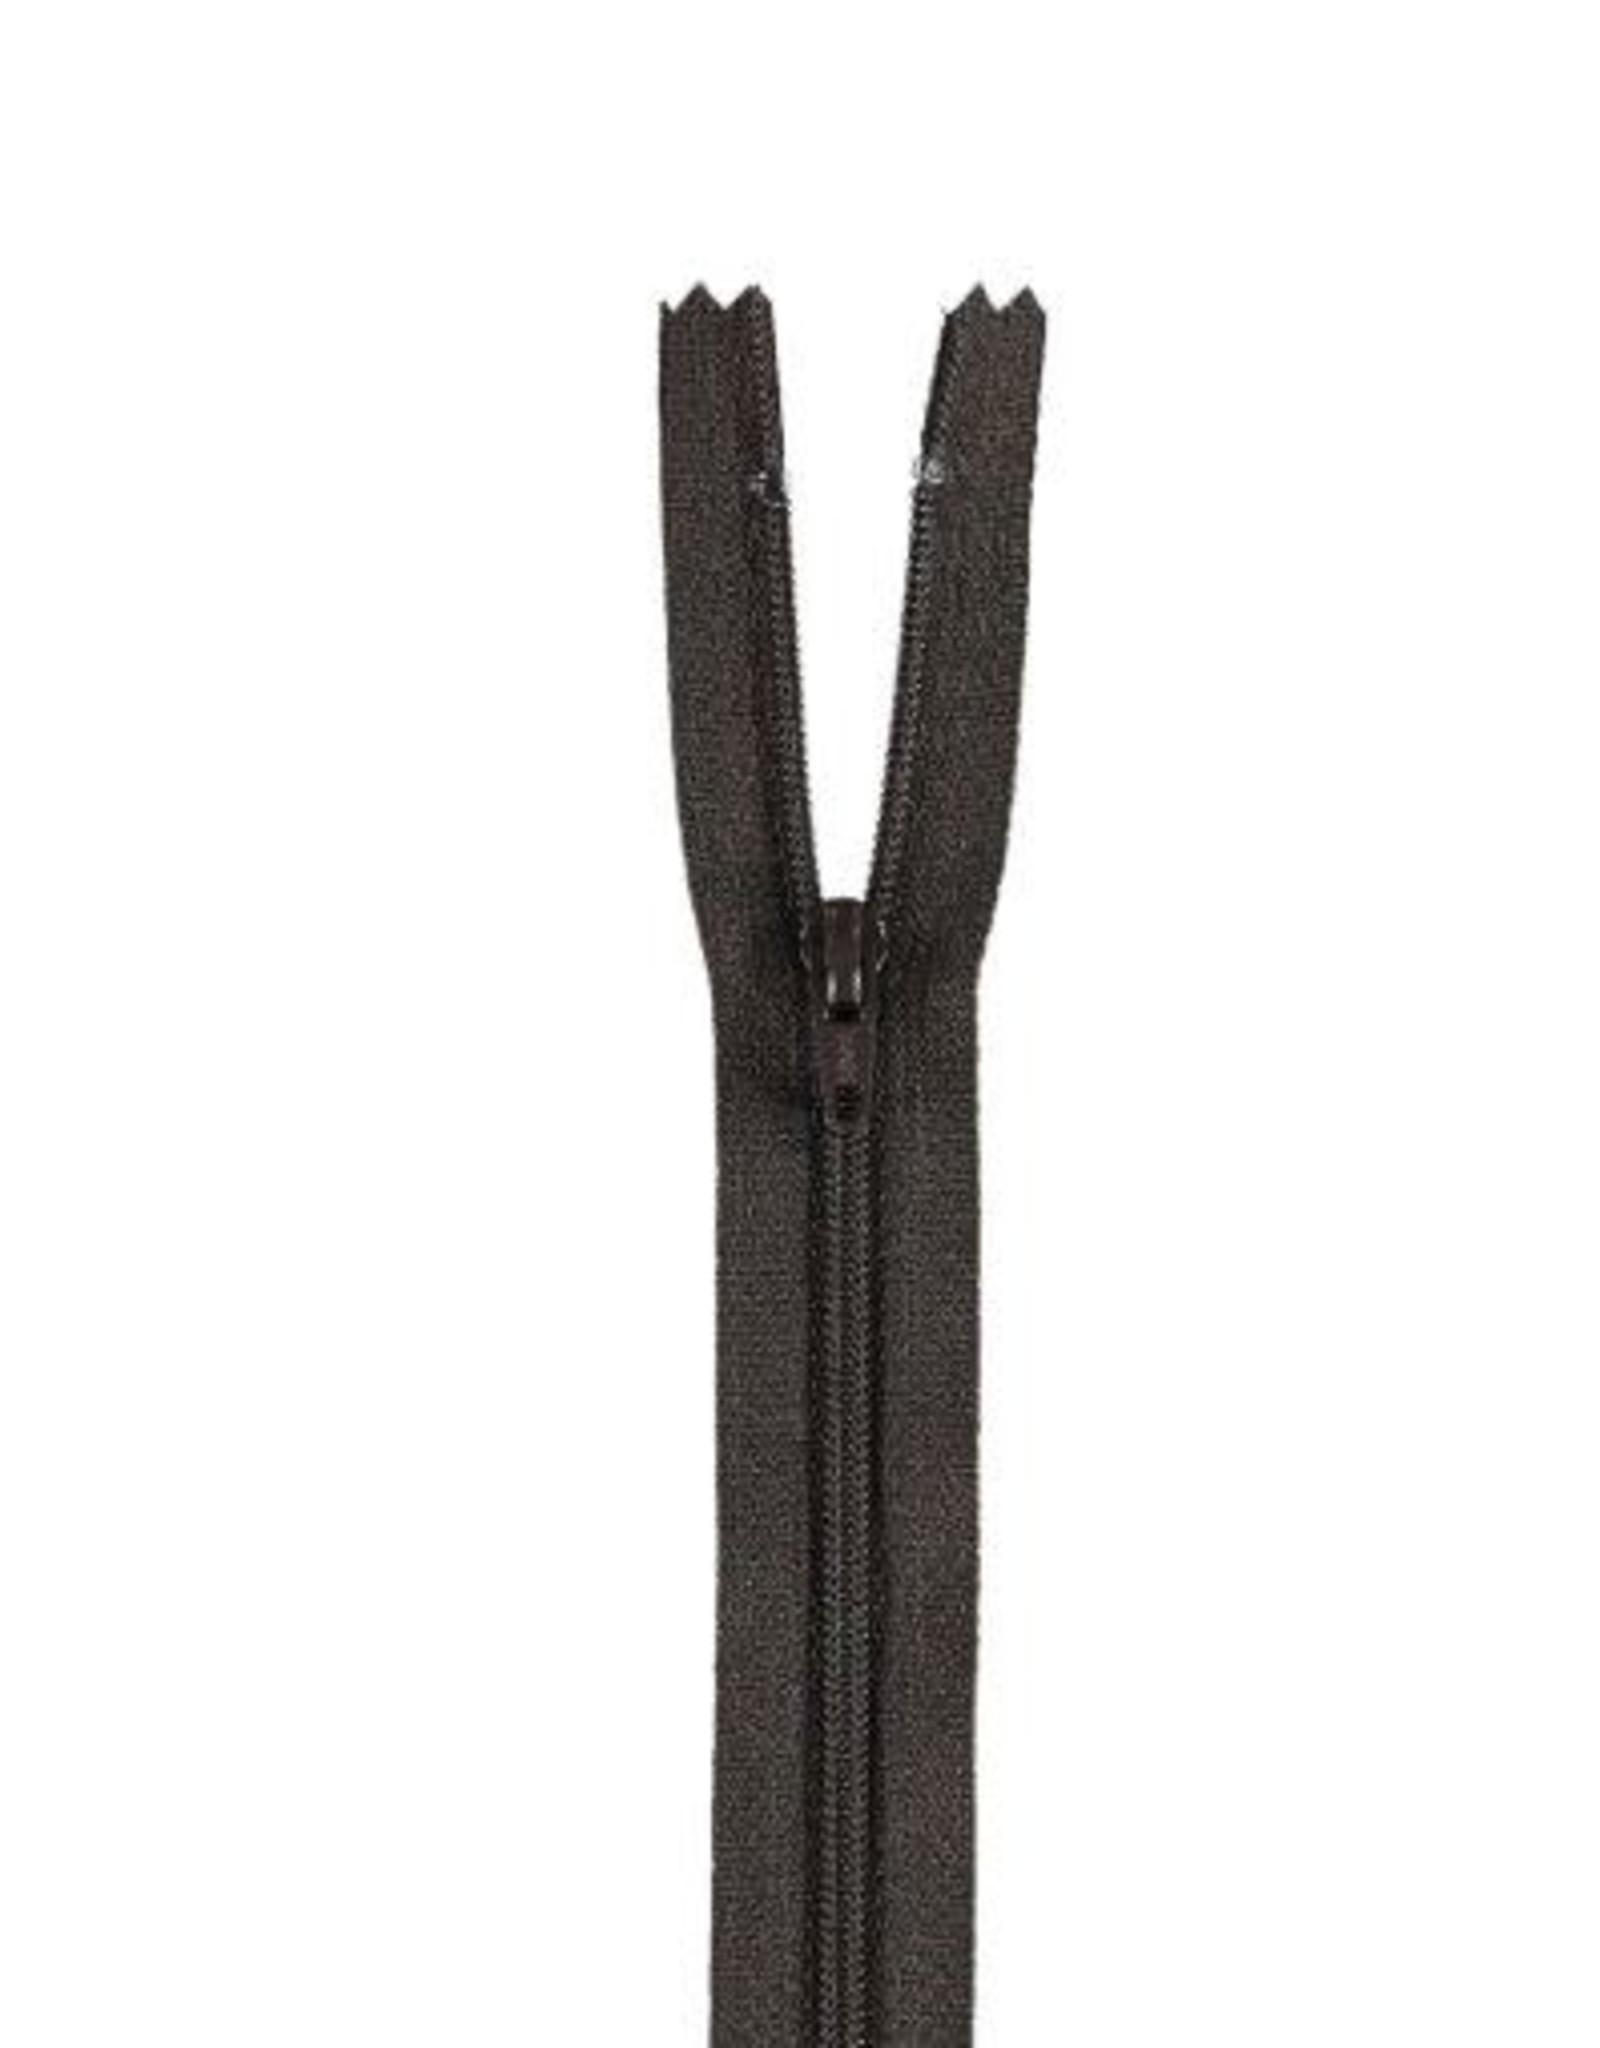 YKK Spiraalrits niet-DB 3mm zwart bruin 916-50cm